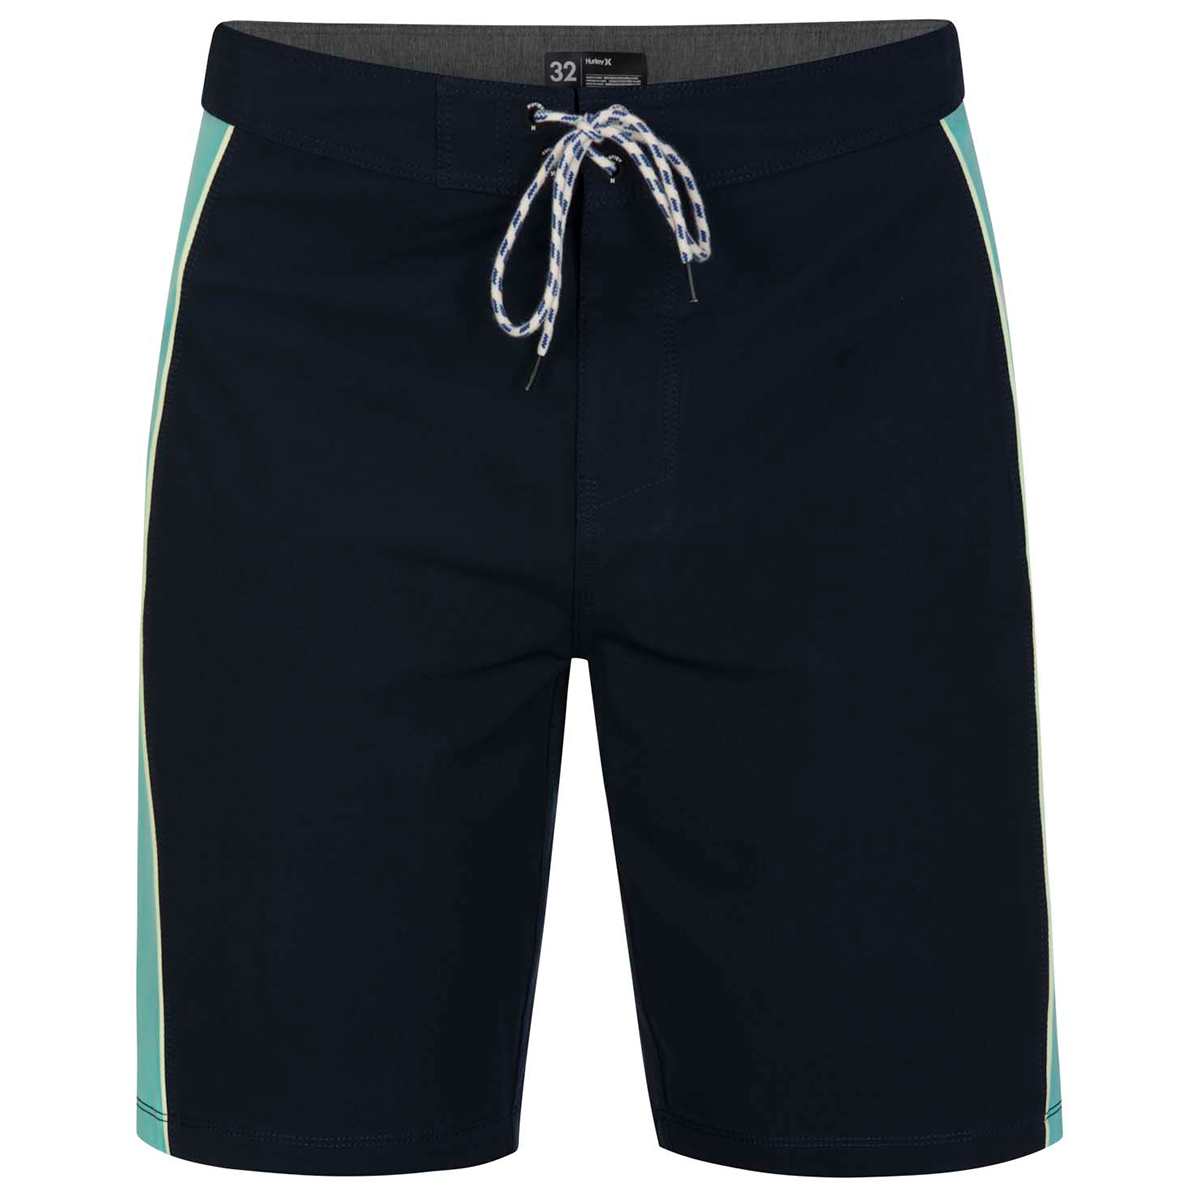 "Hurley Men's Phantom Fastlane 20"" Board Shorts - Blue, 30"